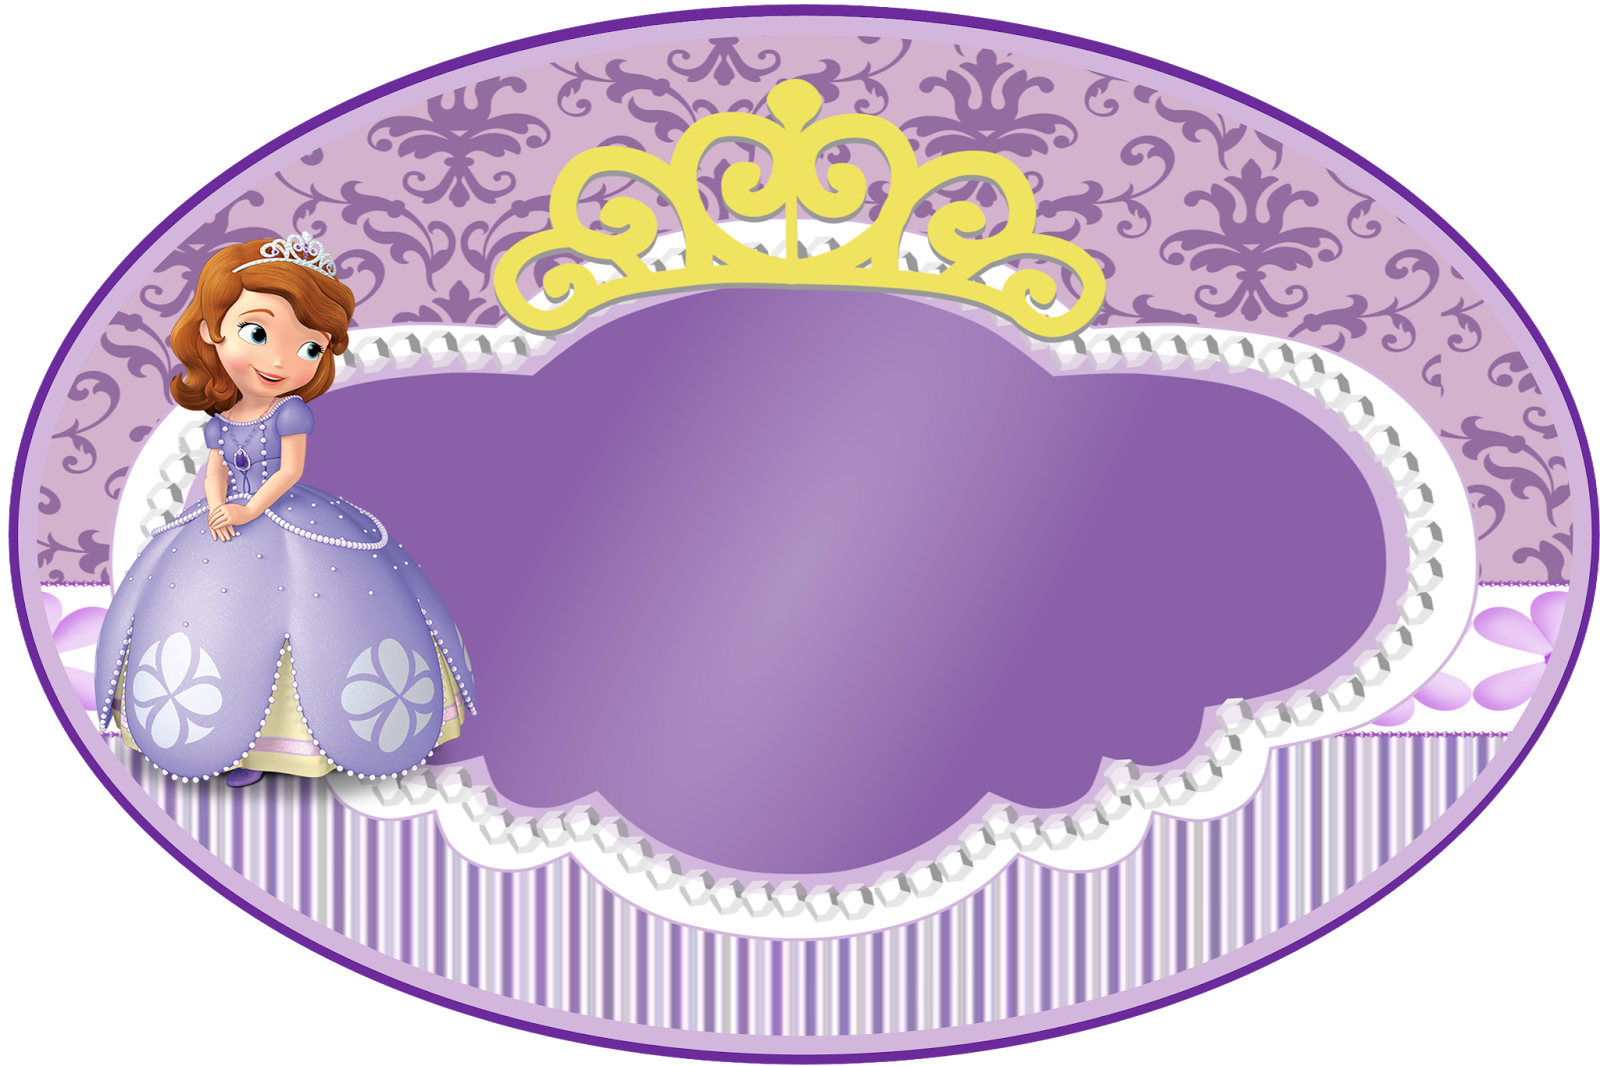 Princess First Birthday Invitations 004 - Princess First Birthday Invitations